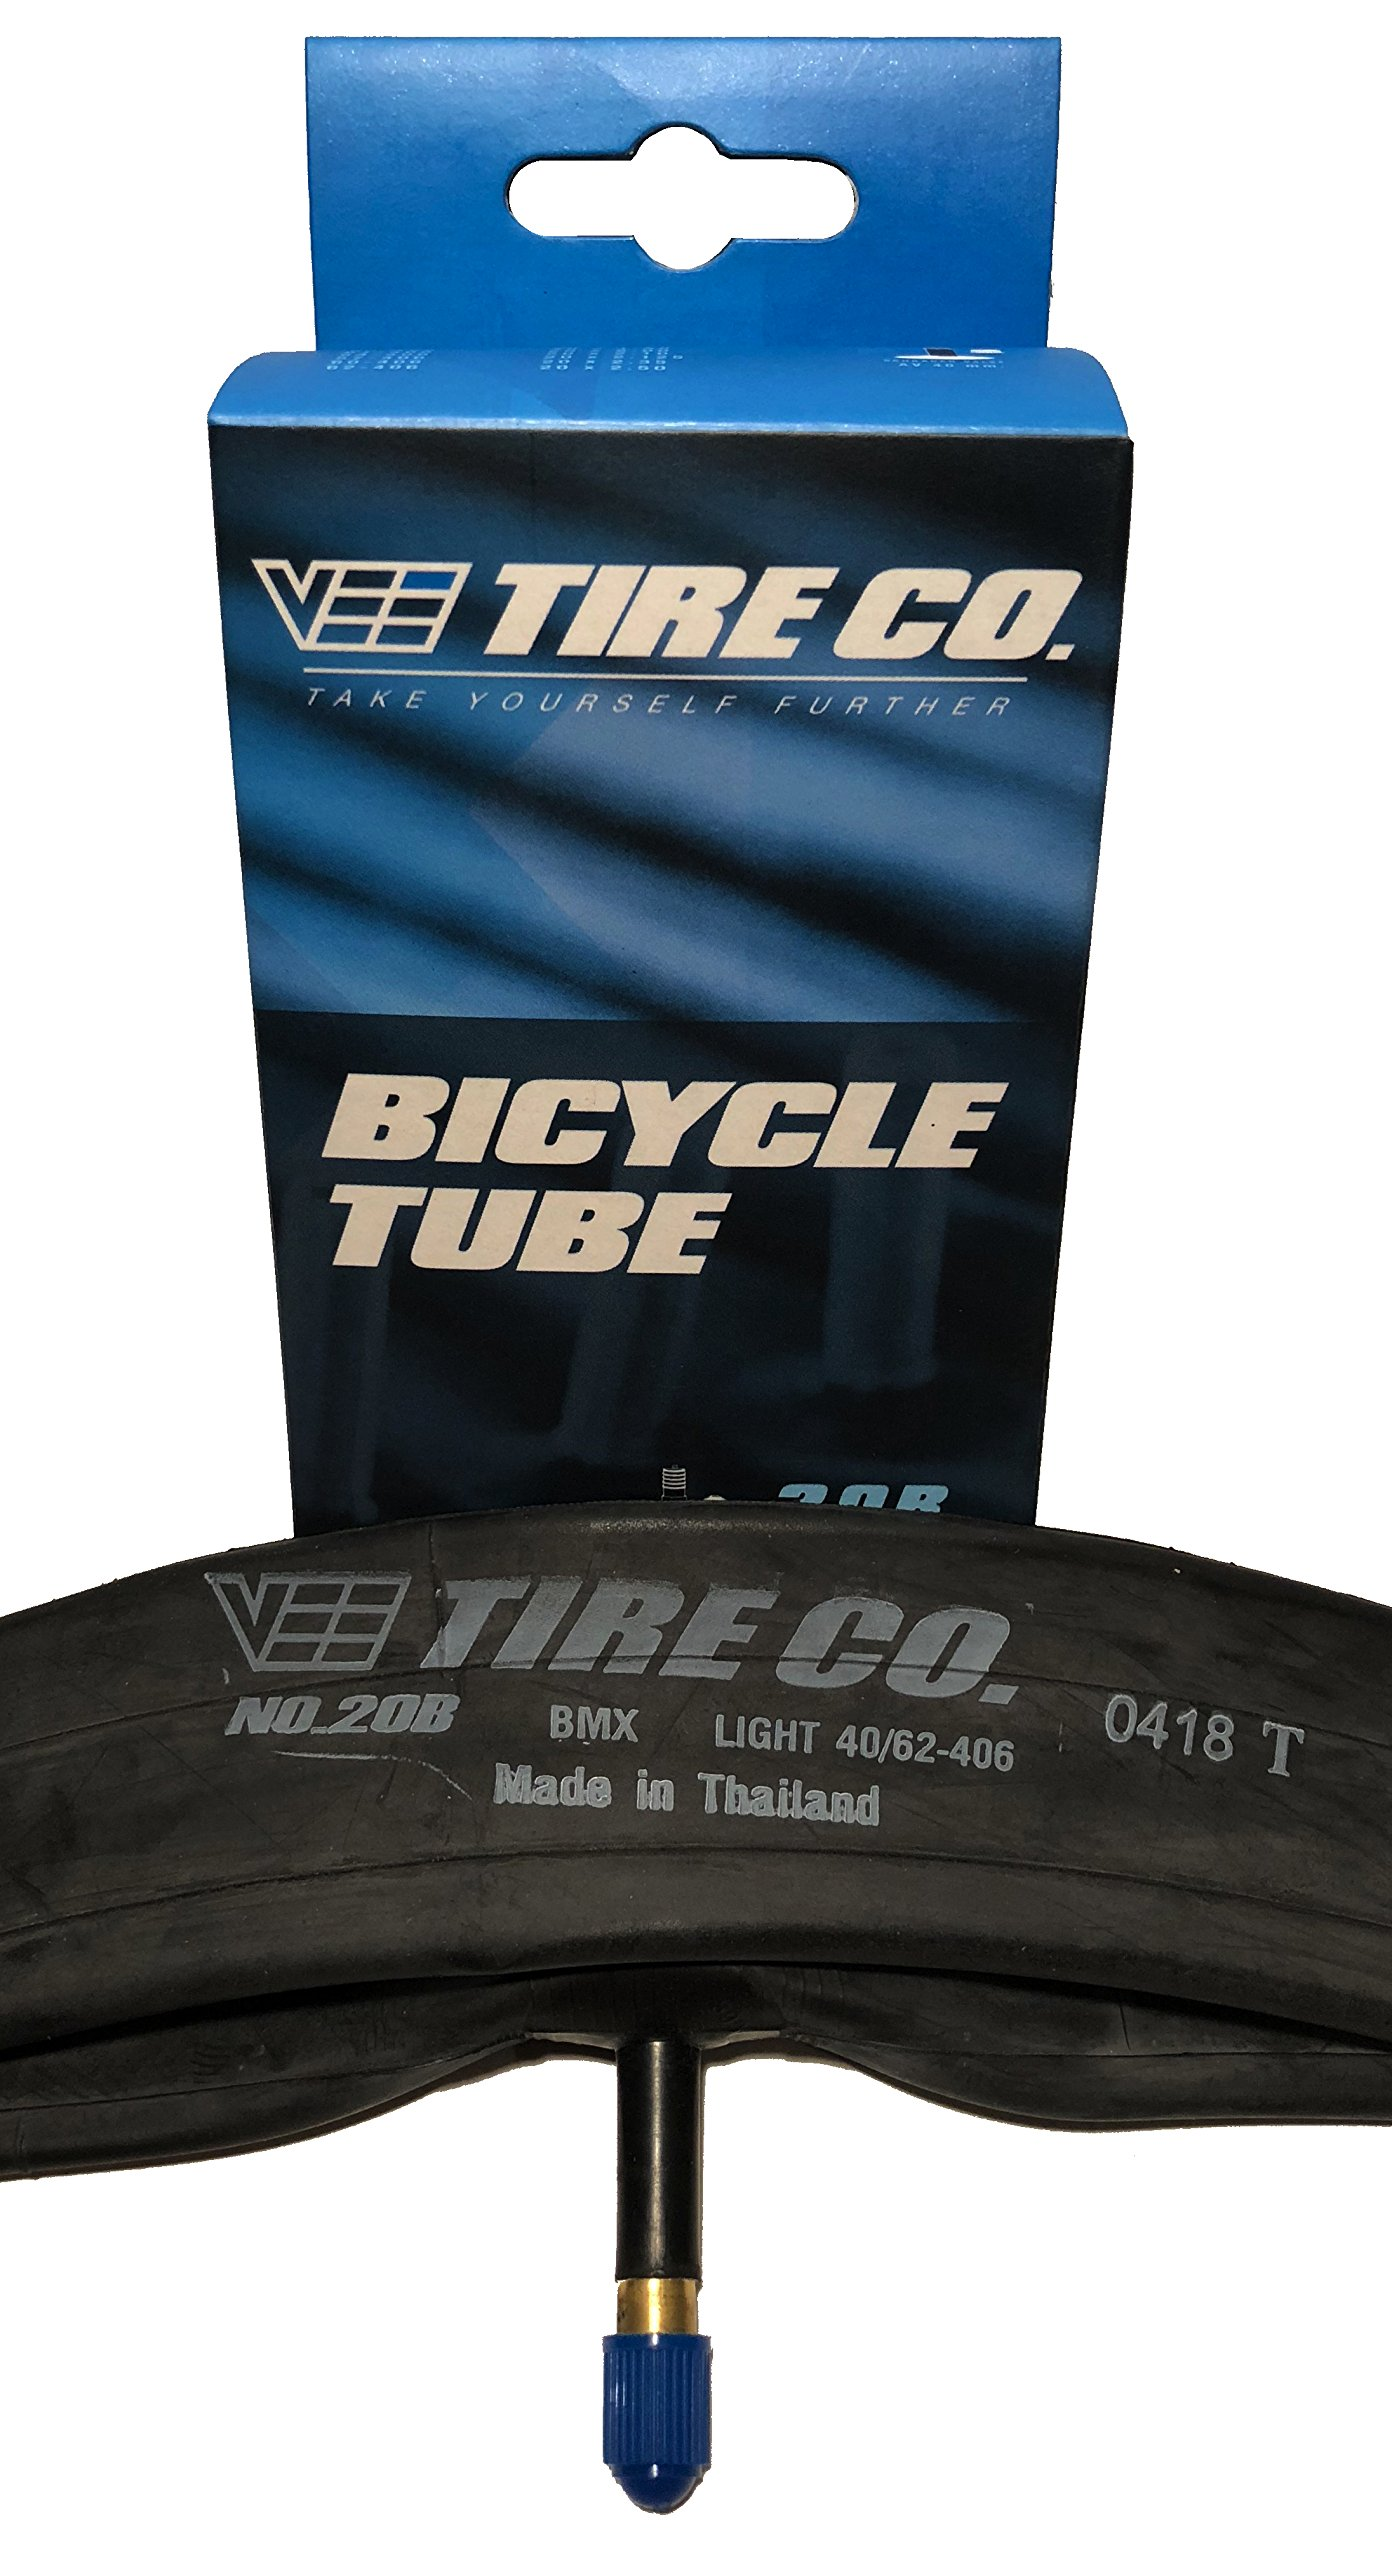 Pair (2) 20x2.10 Vee Tire 20 inch Bike Tire Bicycle Inner Tube Schrader Valve